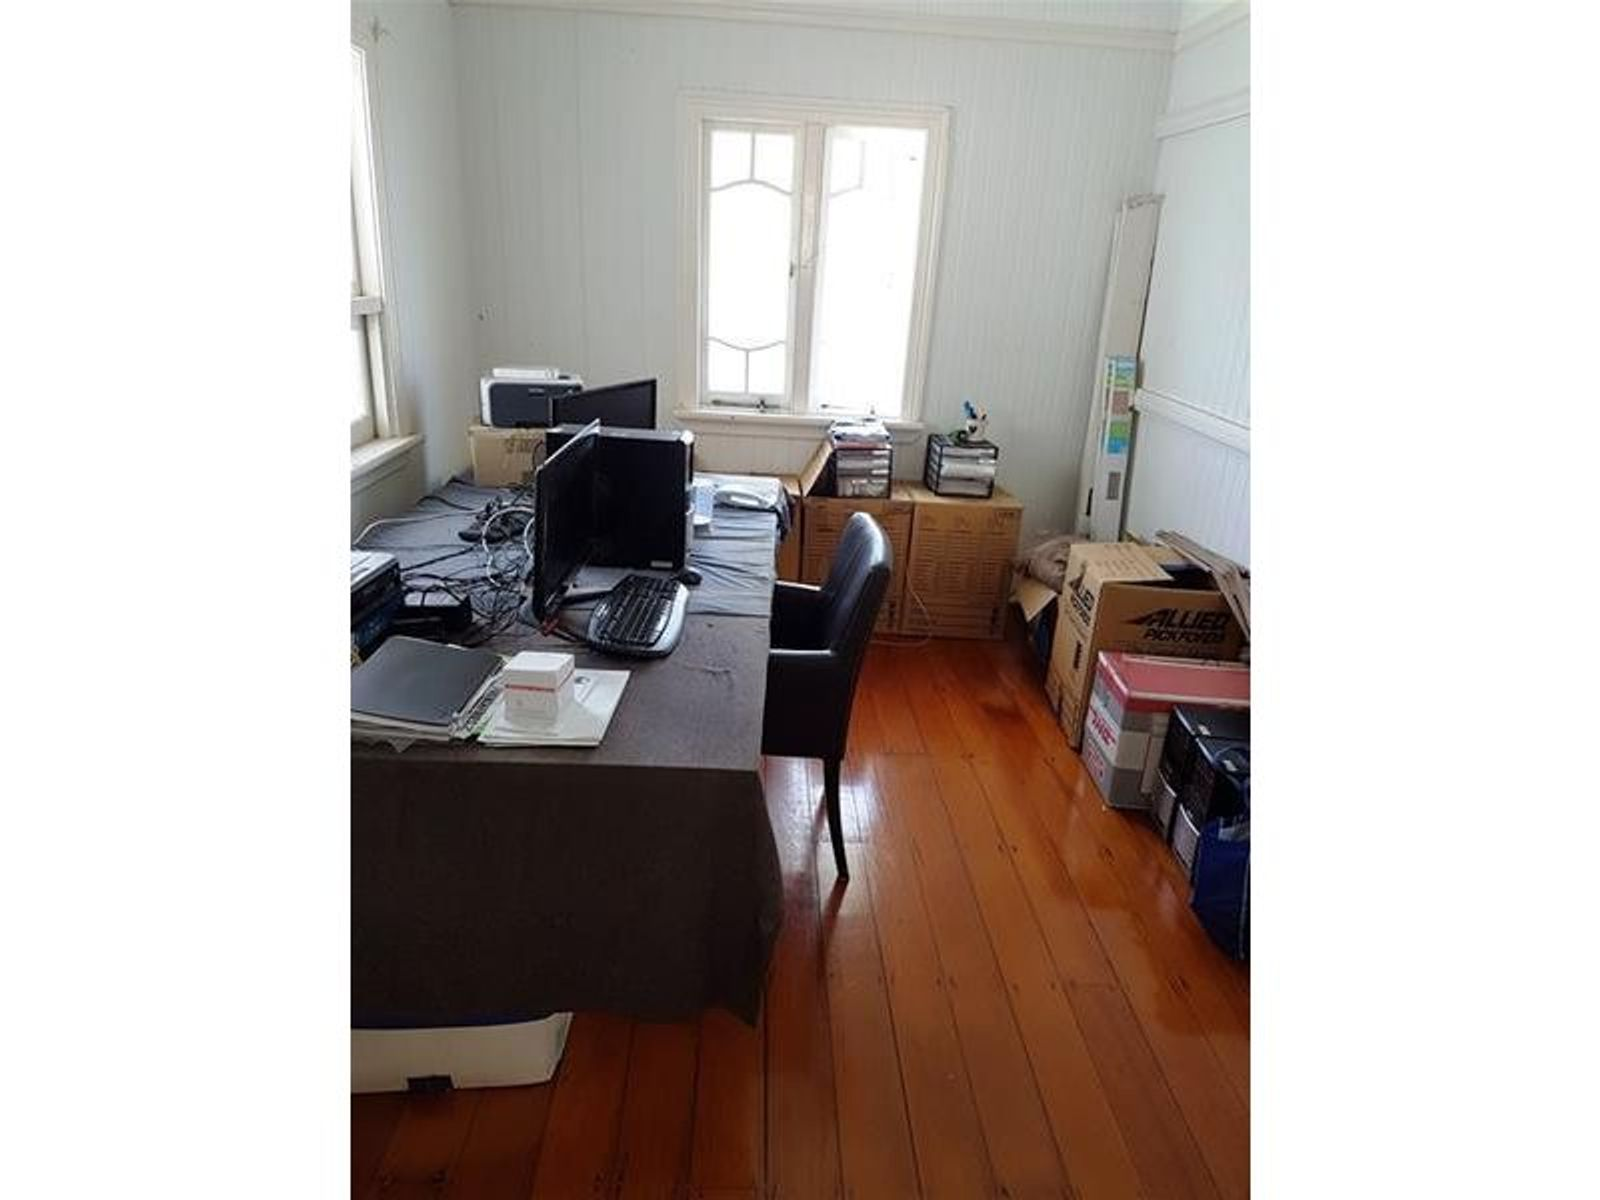 16 GLADY Street, Innisfail, QLD 4860